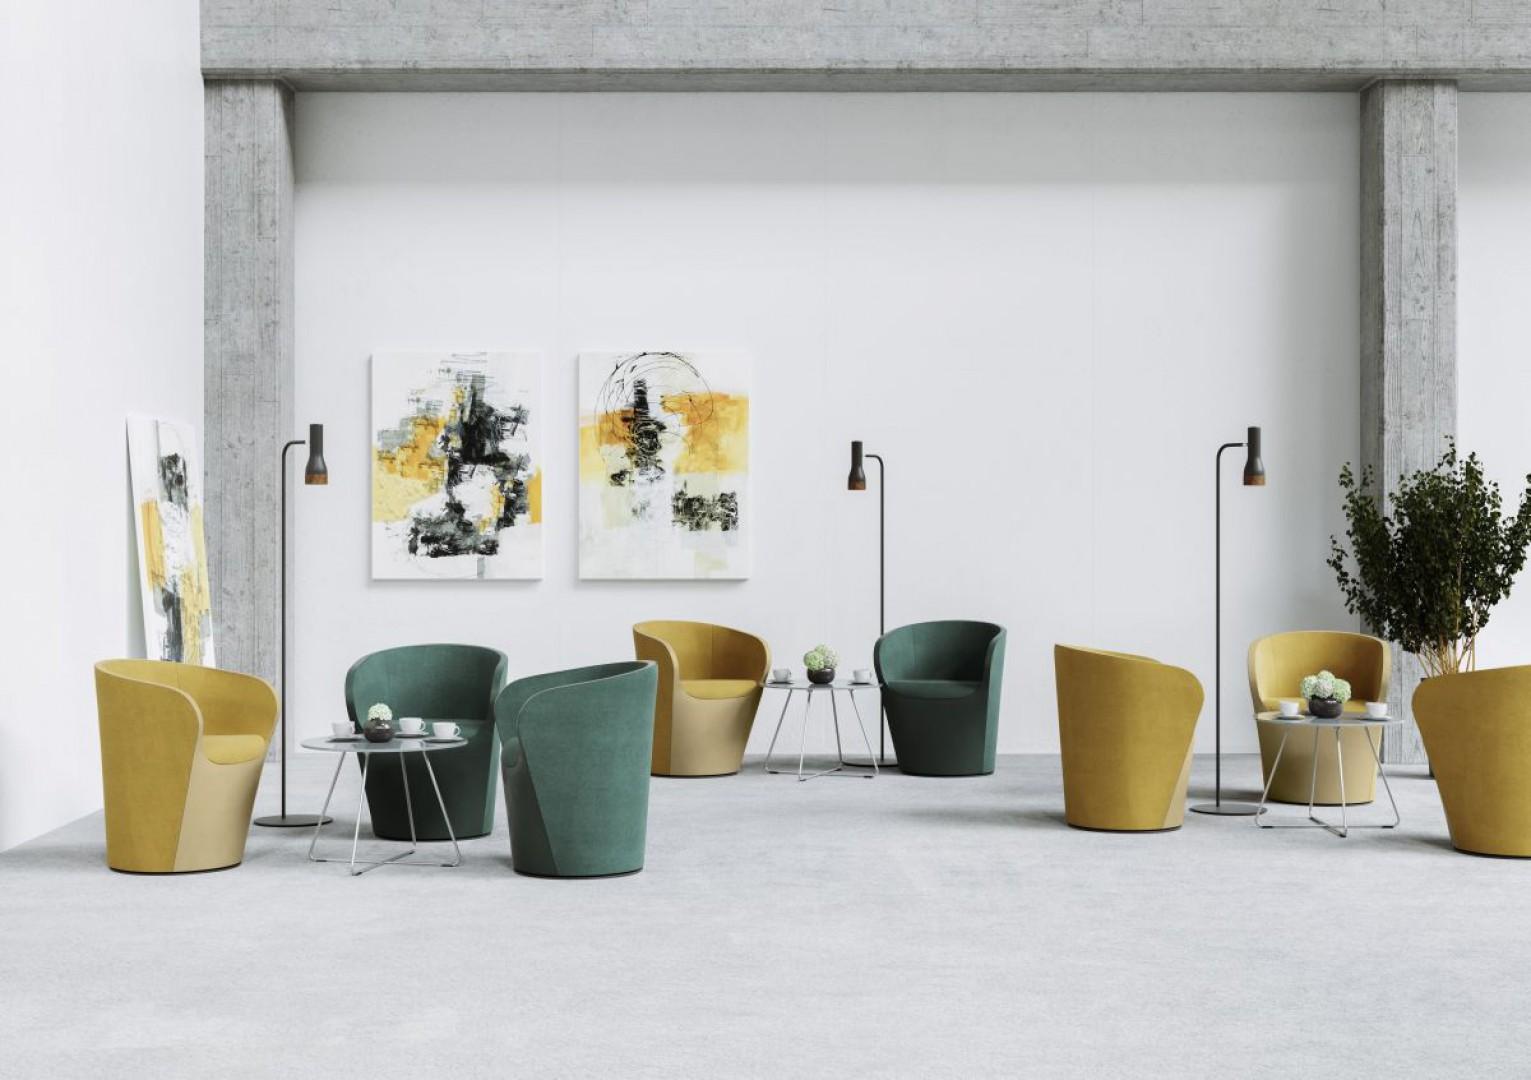 Kolekcja foteli Nu Spin firmy Profim. Fot. Profim